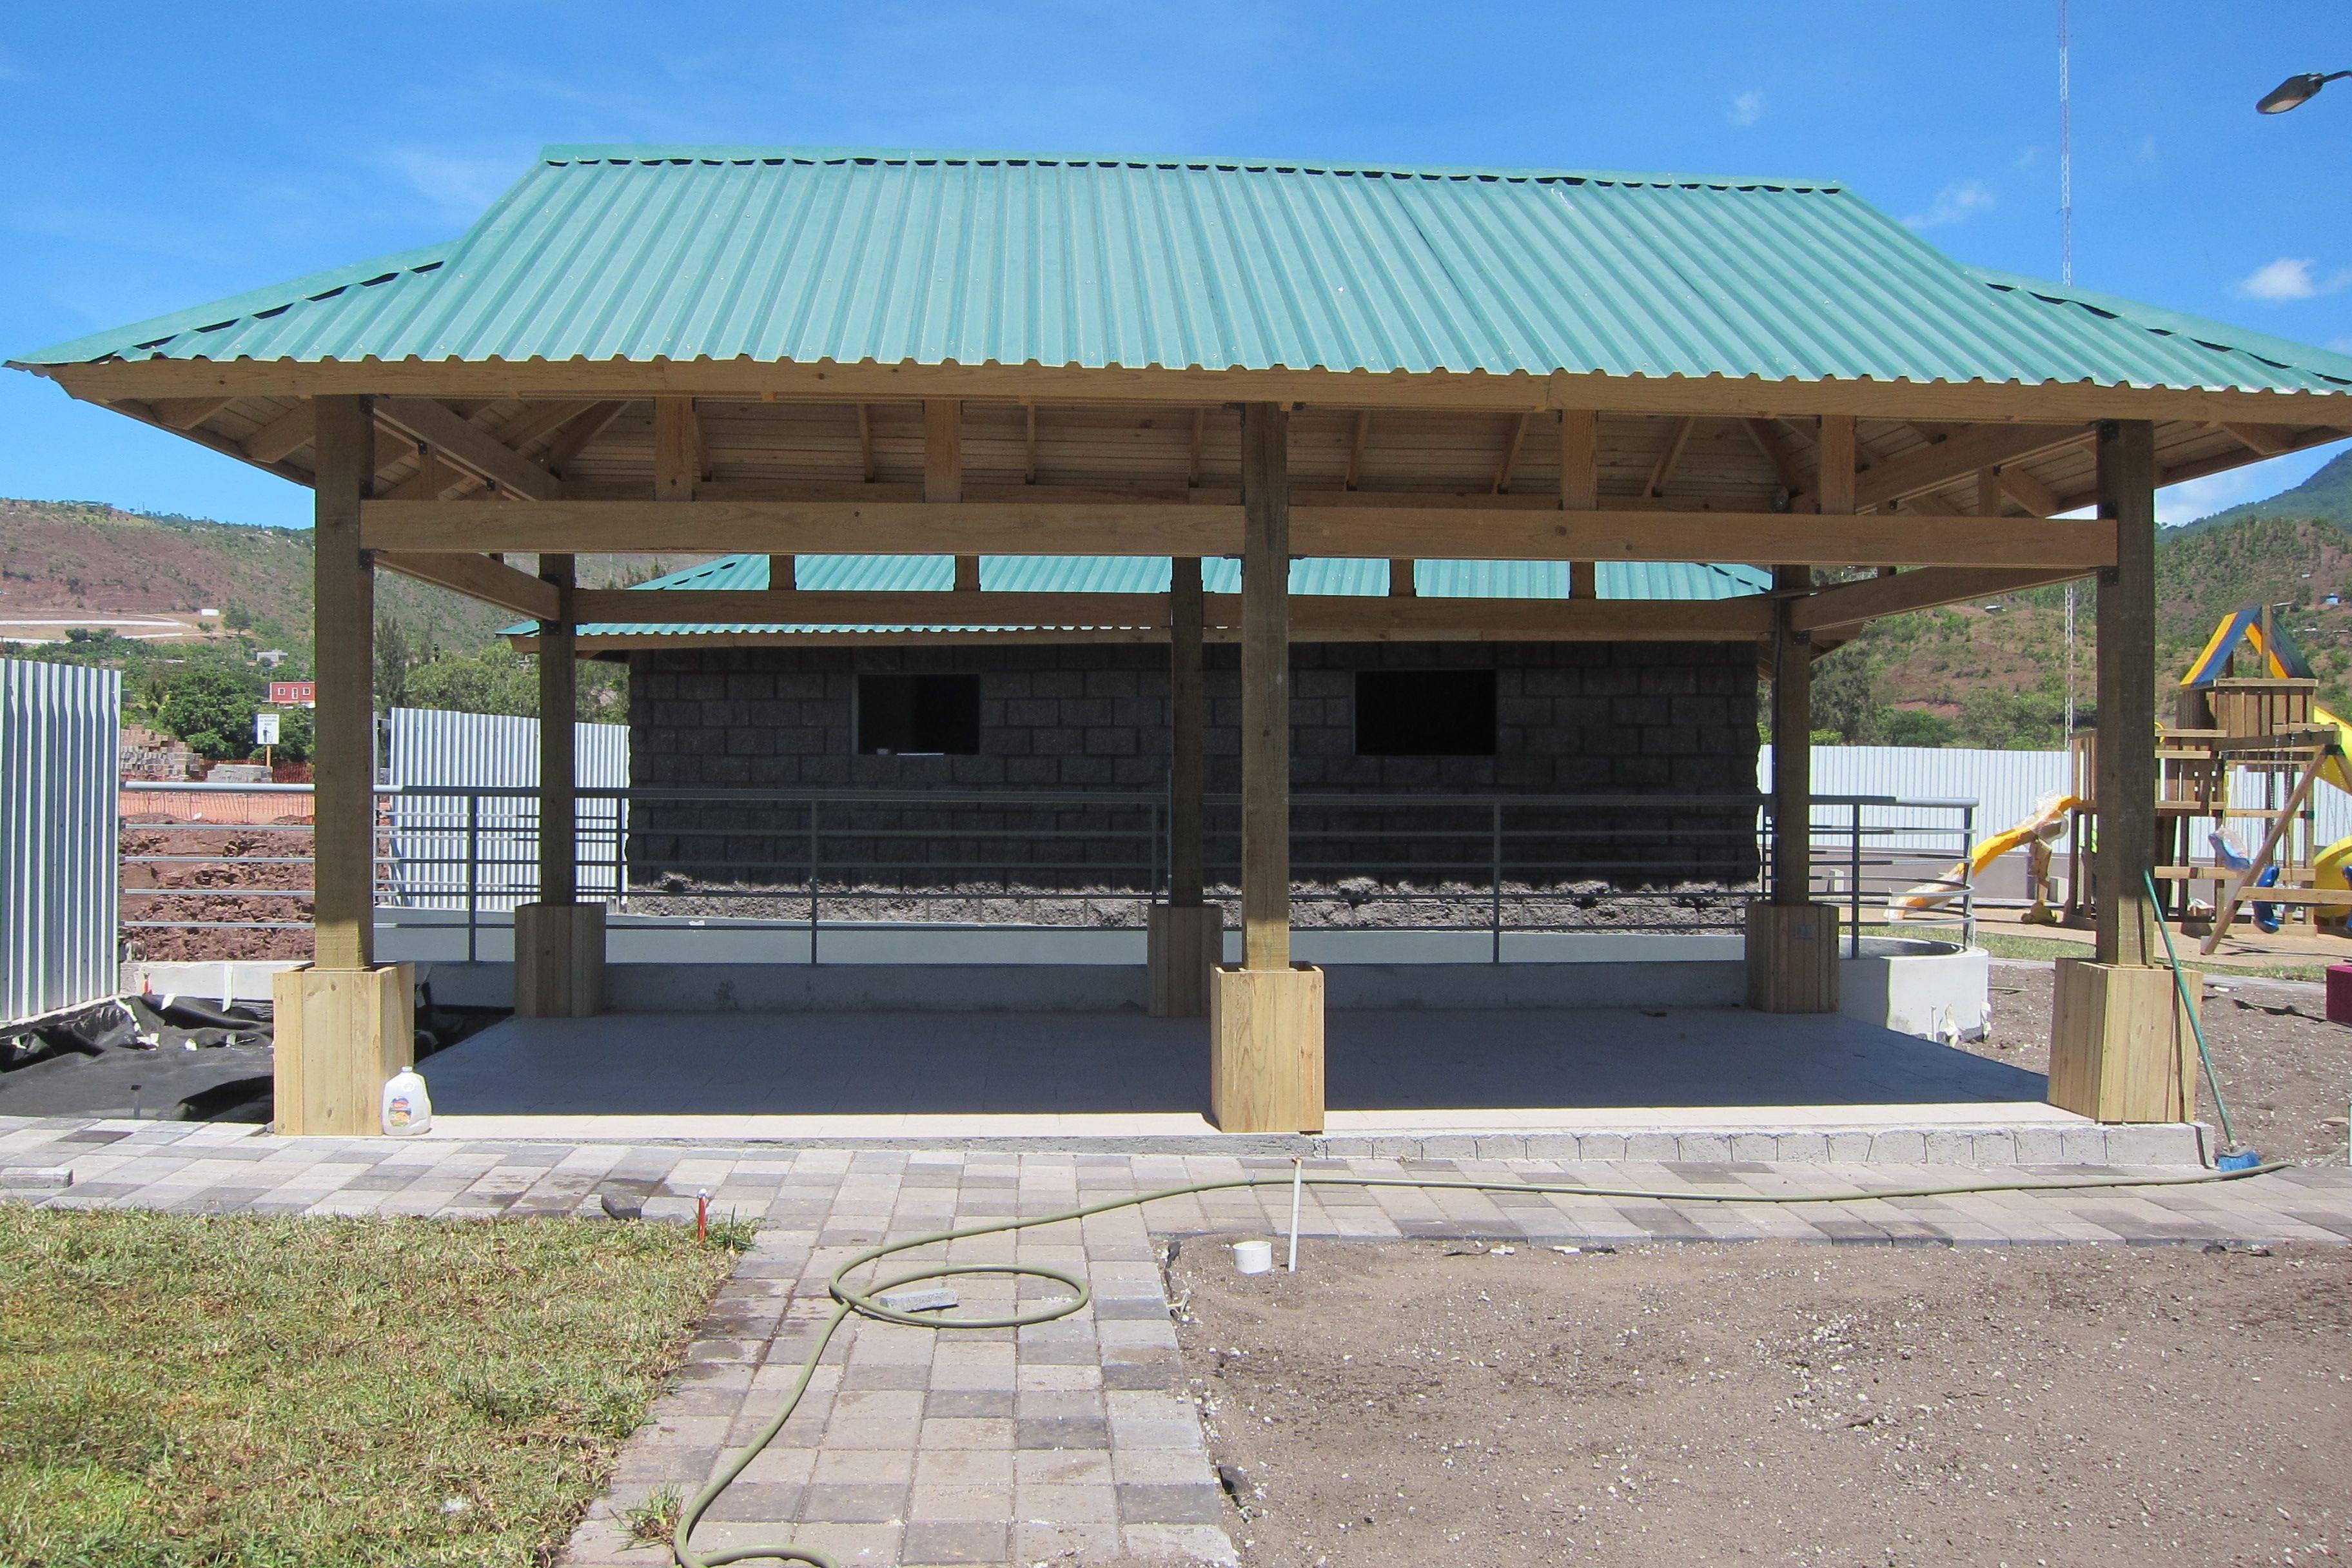 Avances constructivos del rea social kiosco estructura - Estructuras de madera para techos ...